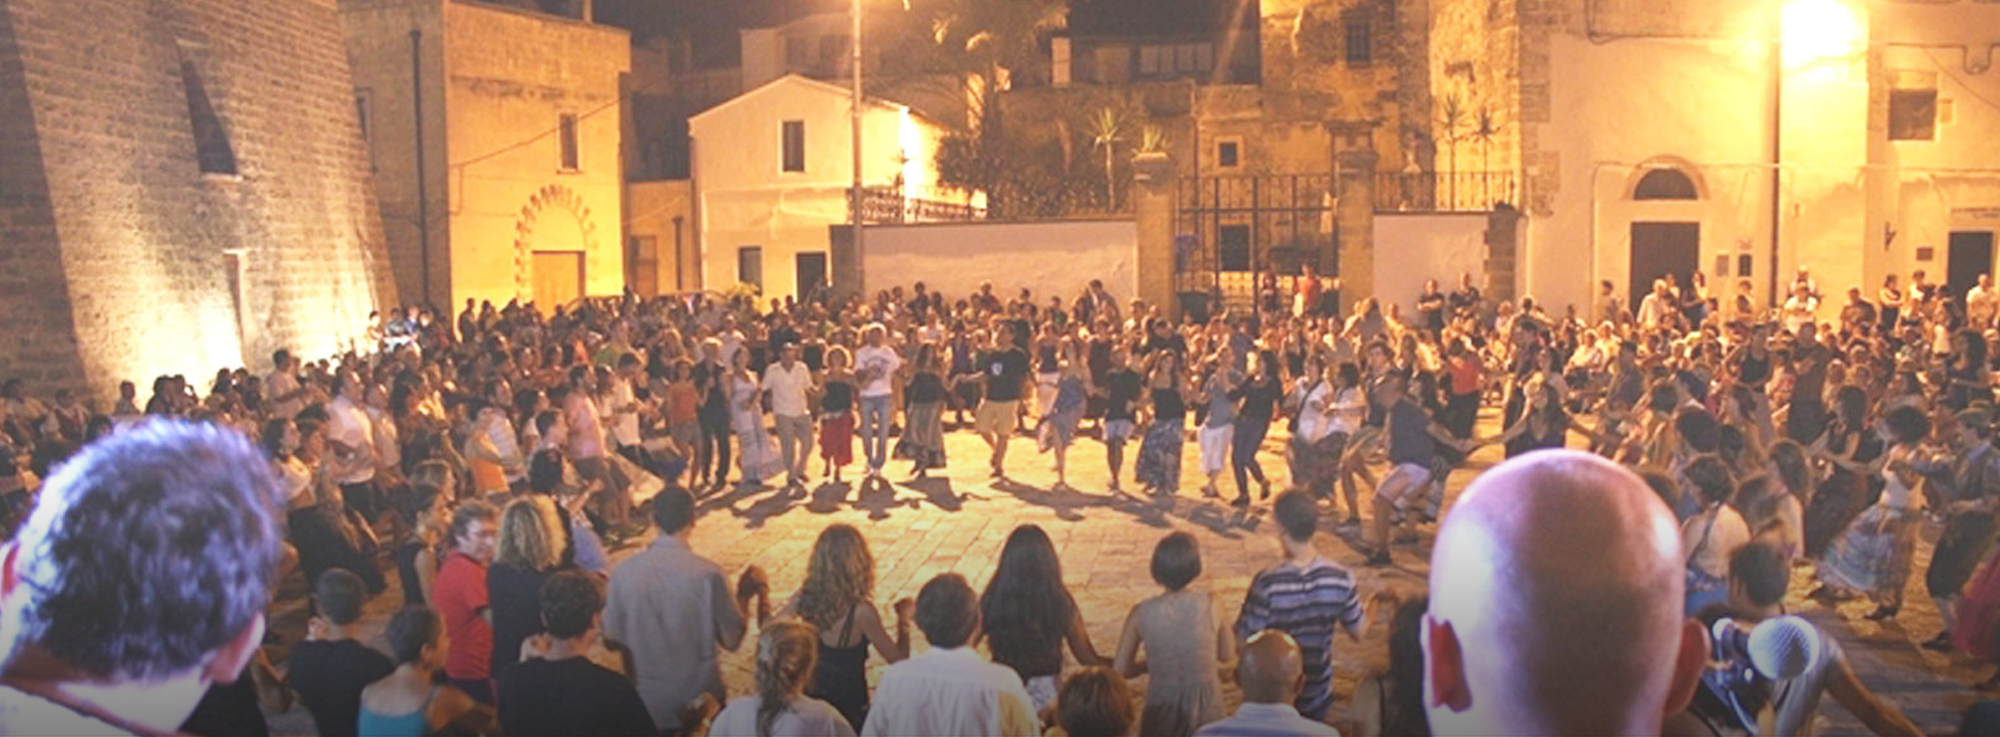 Biccari, Castelluccio Valmaggiore: Zingarìa Folk Festival